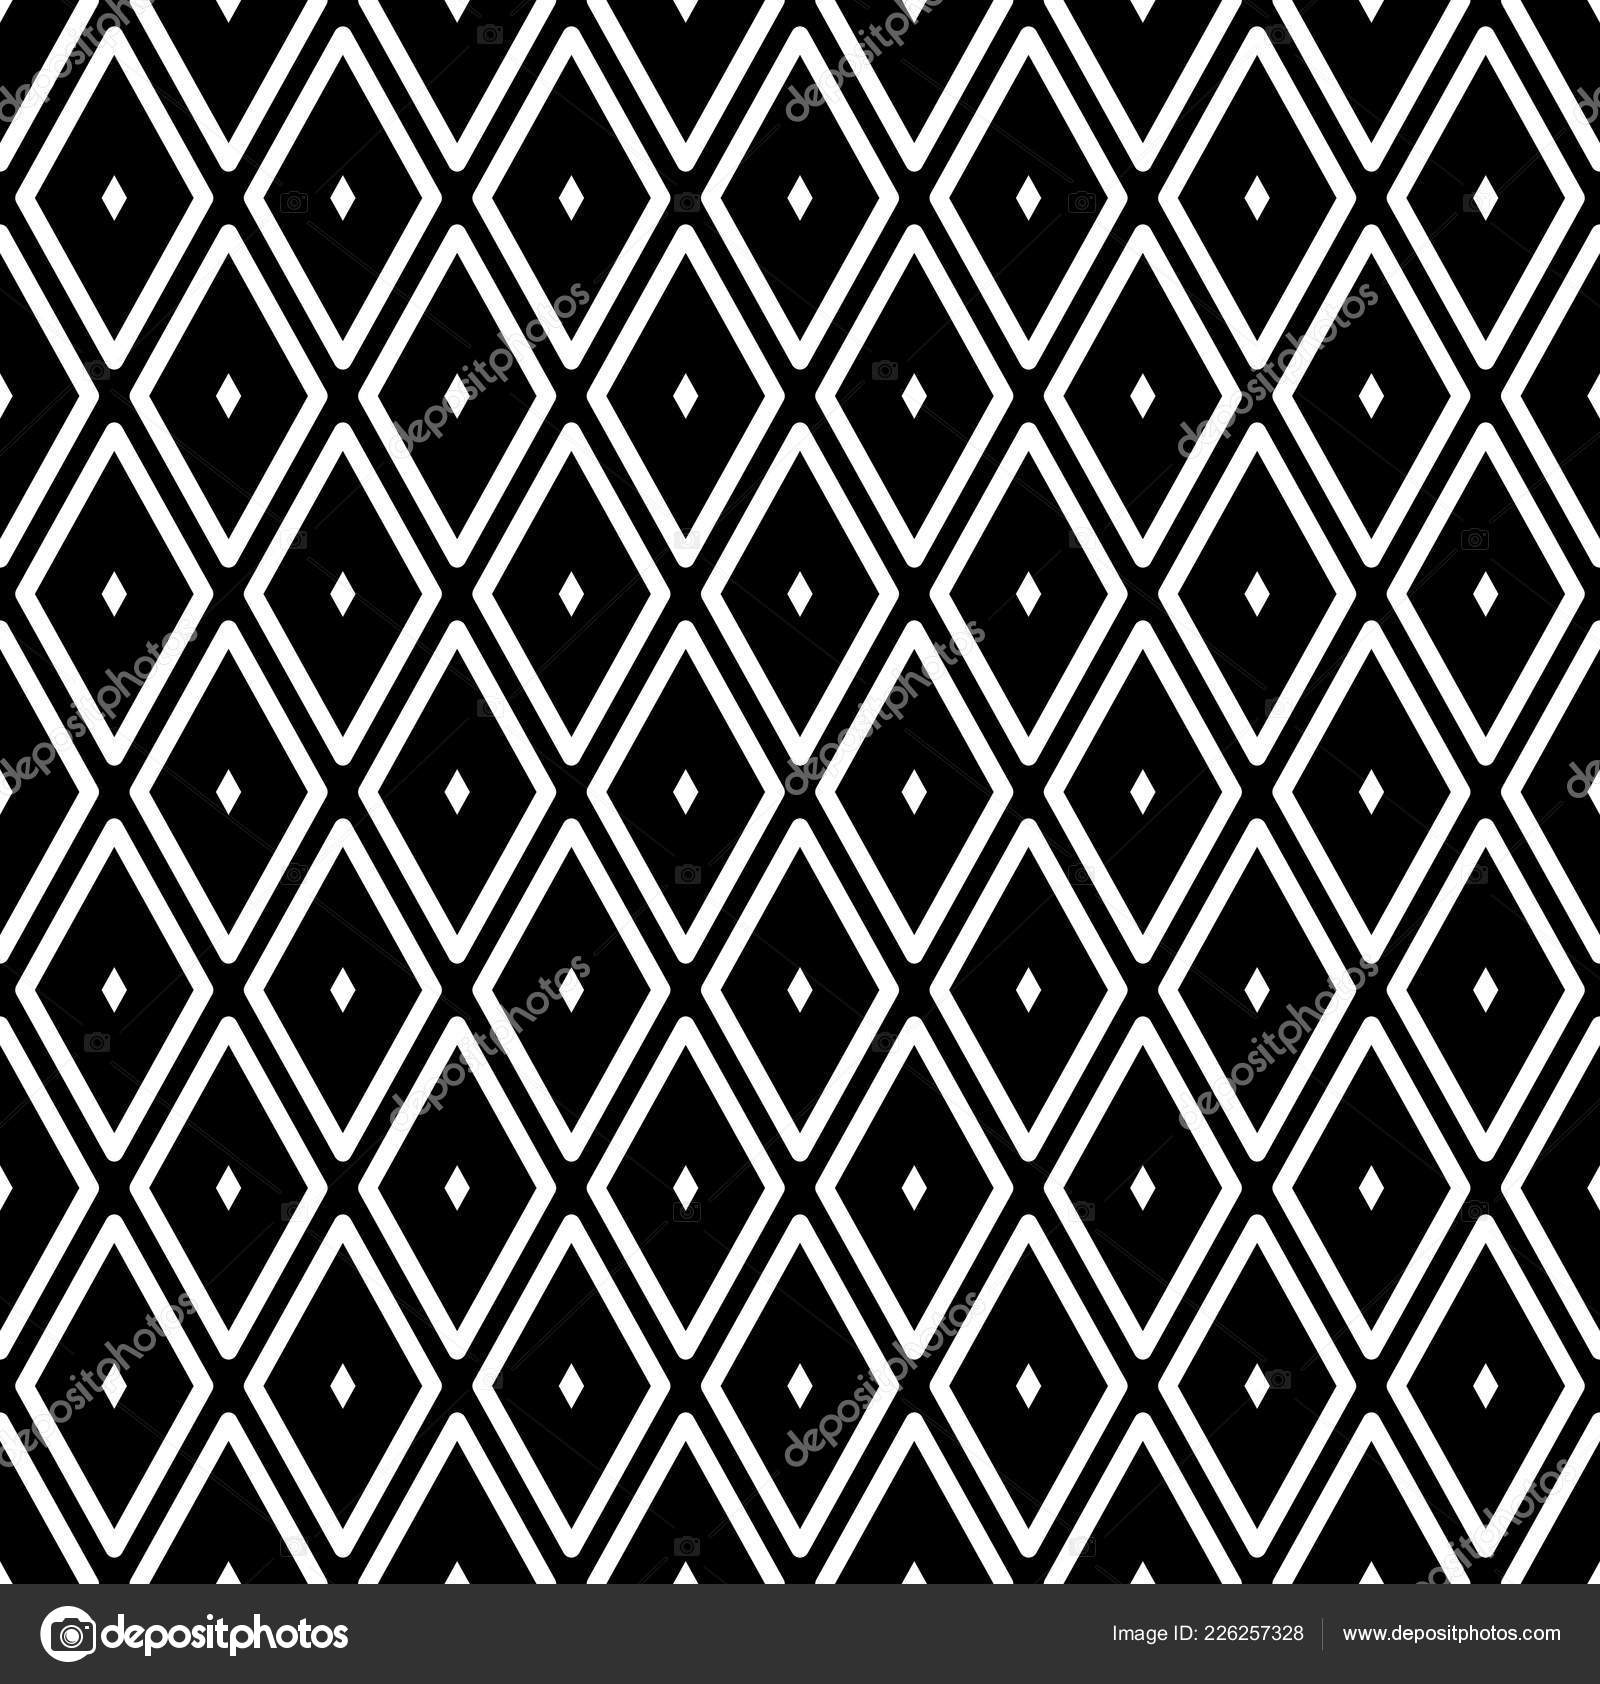 Seamless Diamonds Pattern White Geometric Texture Black Background Vector Art Stock Vector C Troyka 226257328